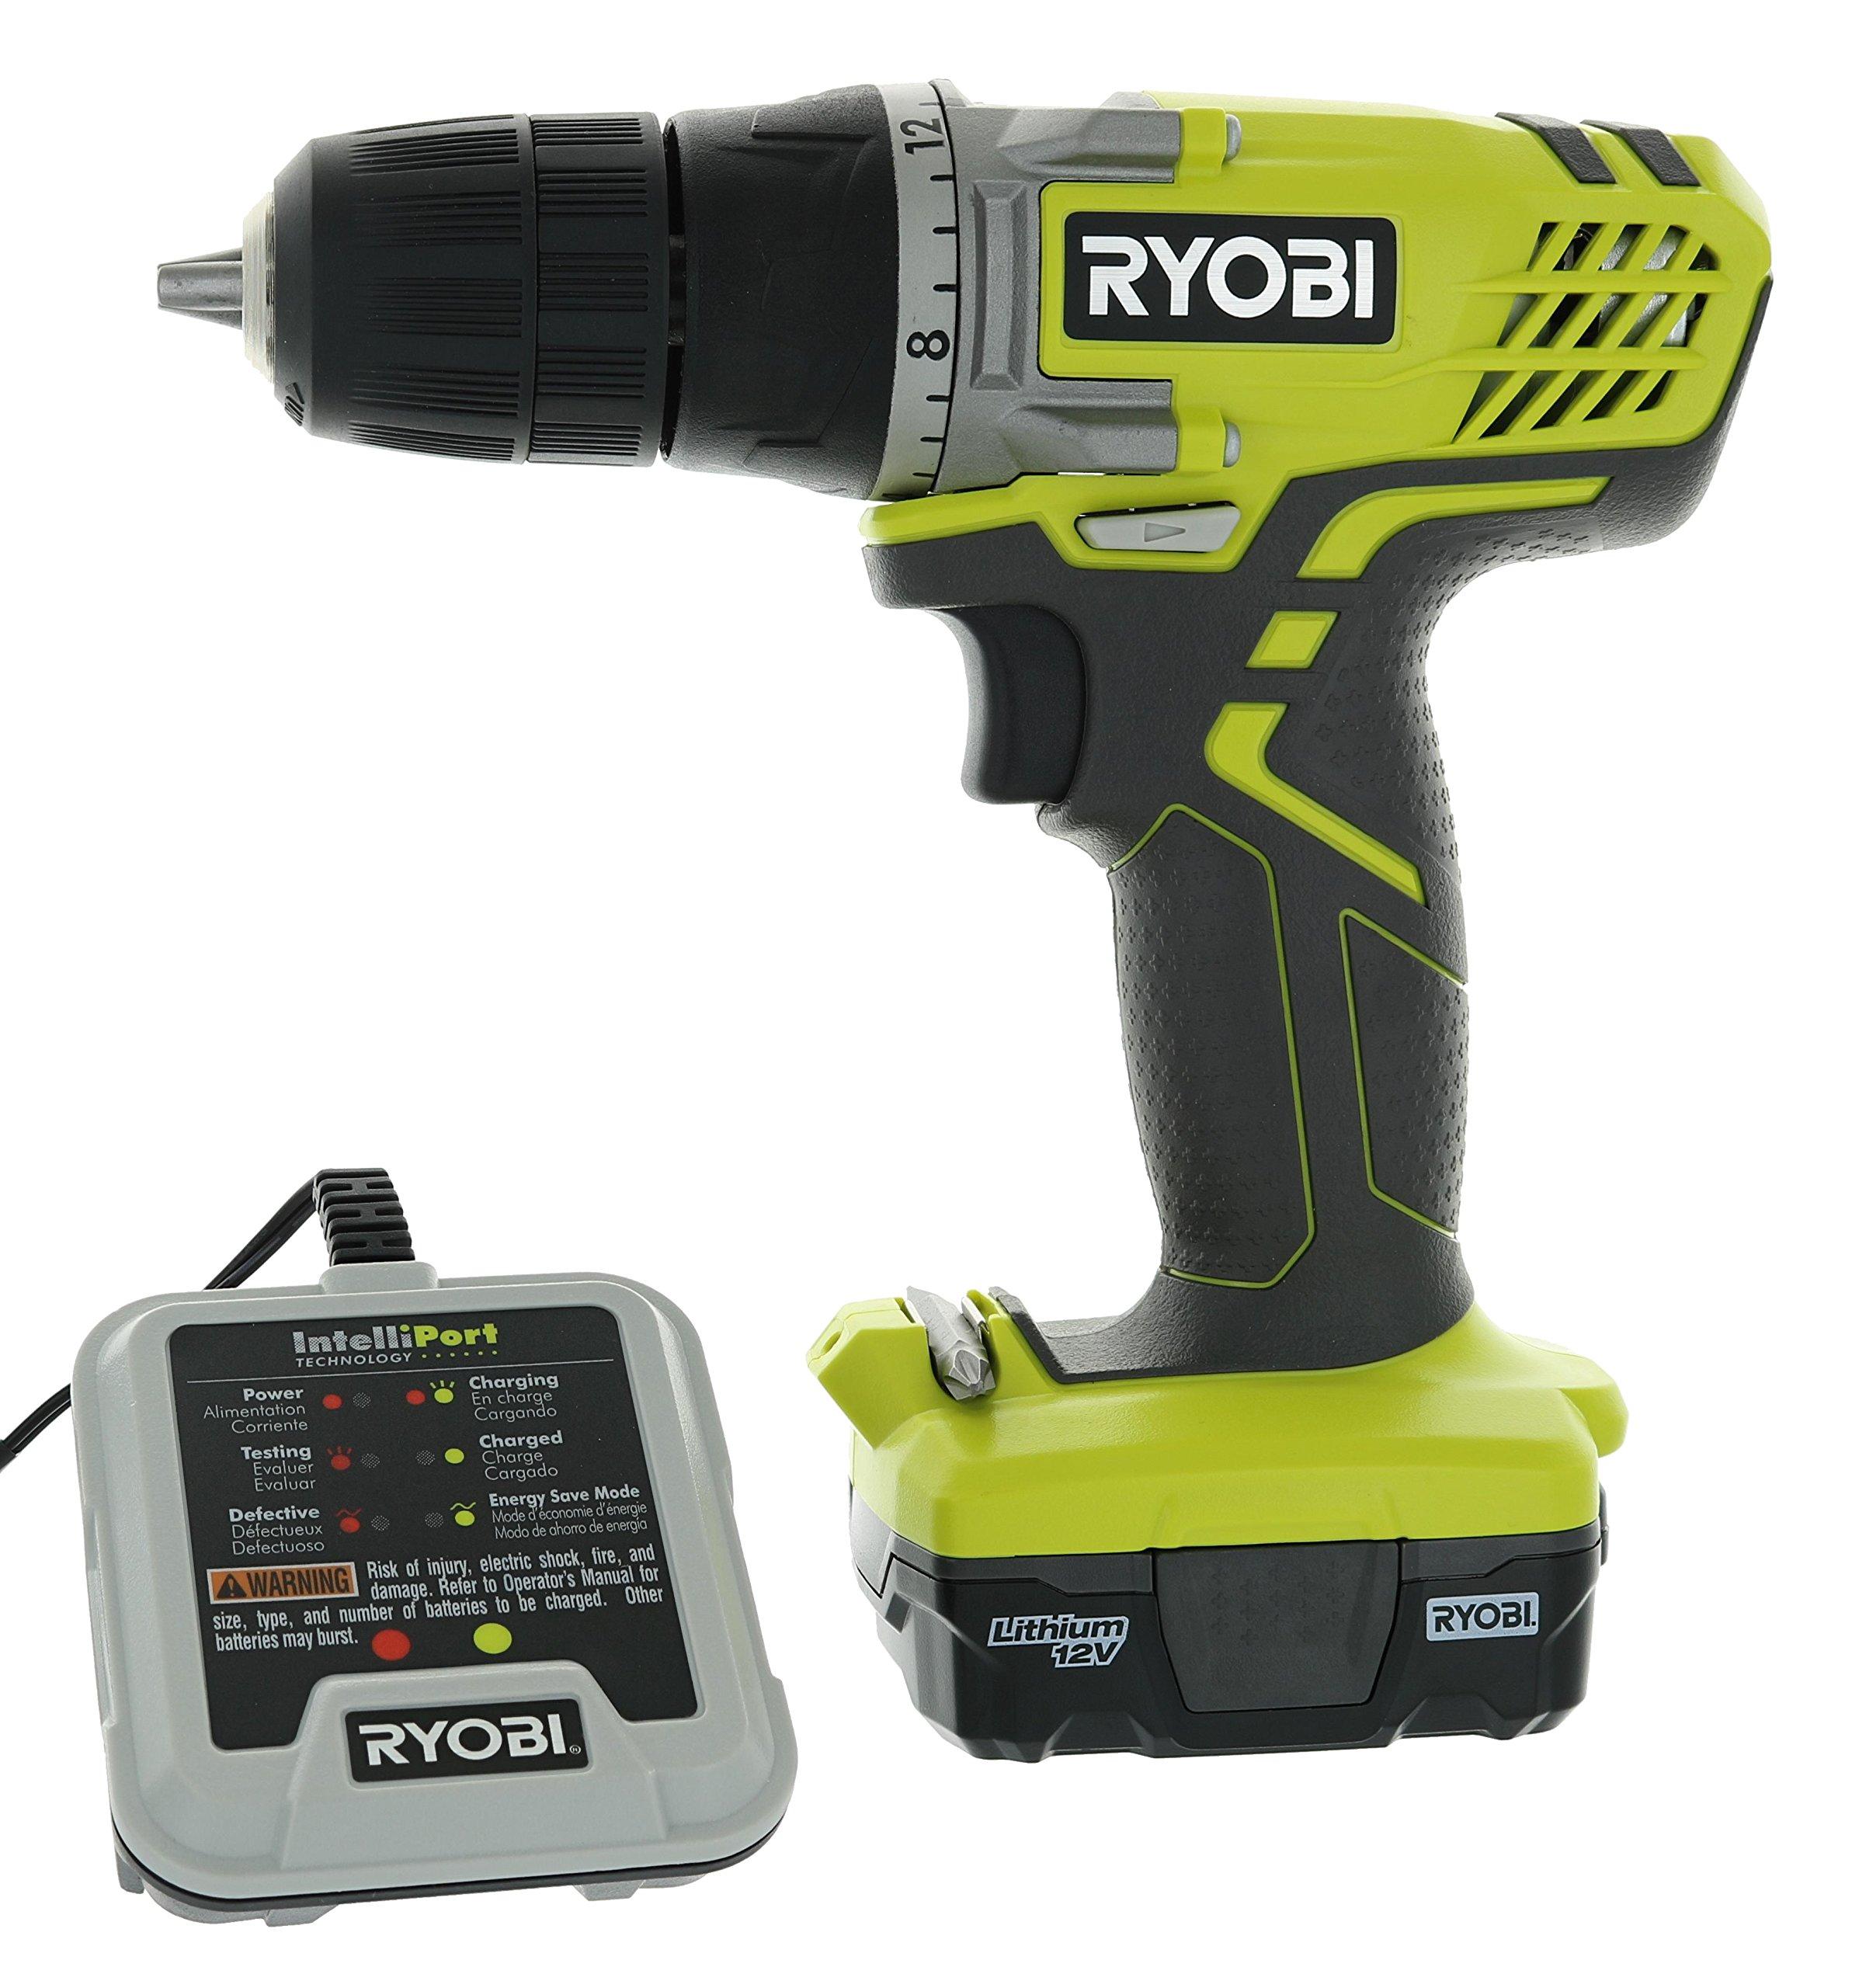 Ryobi Hammer Drill Corded Manual